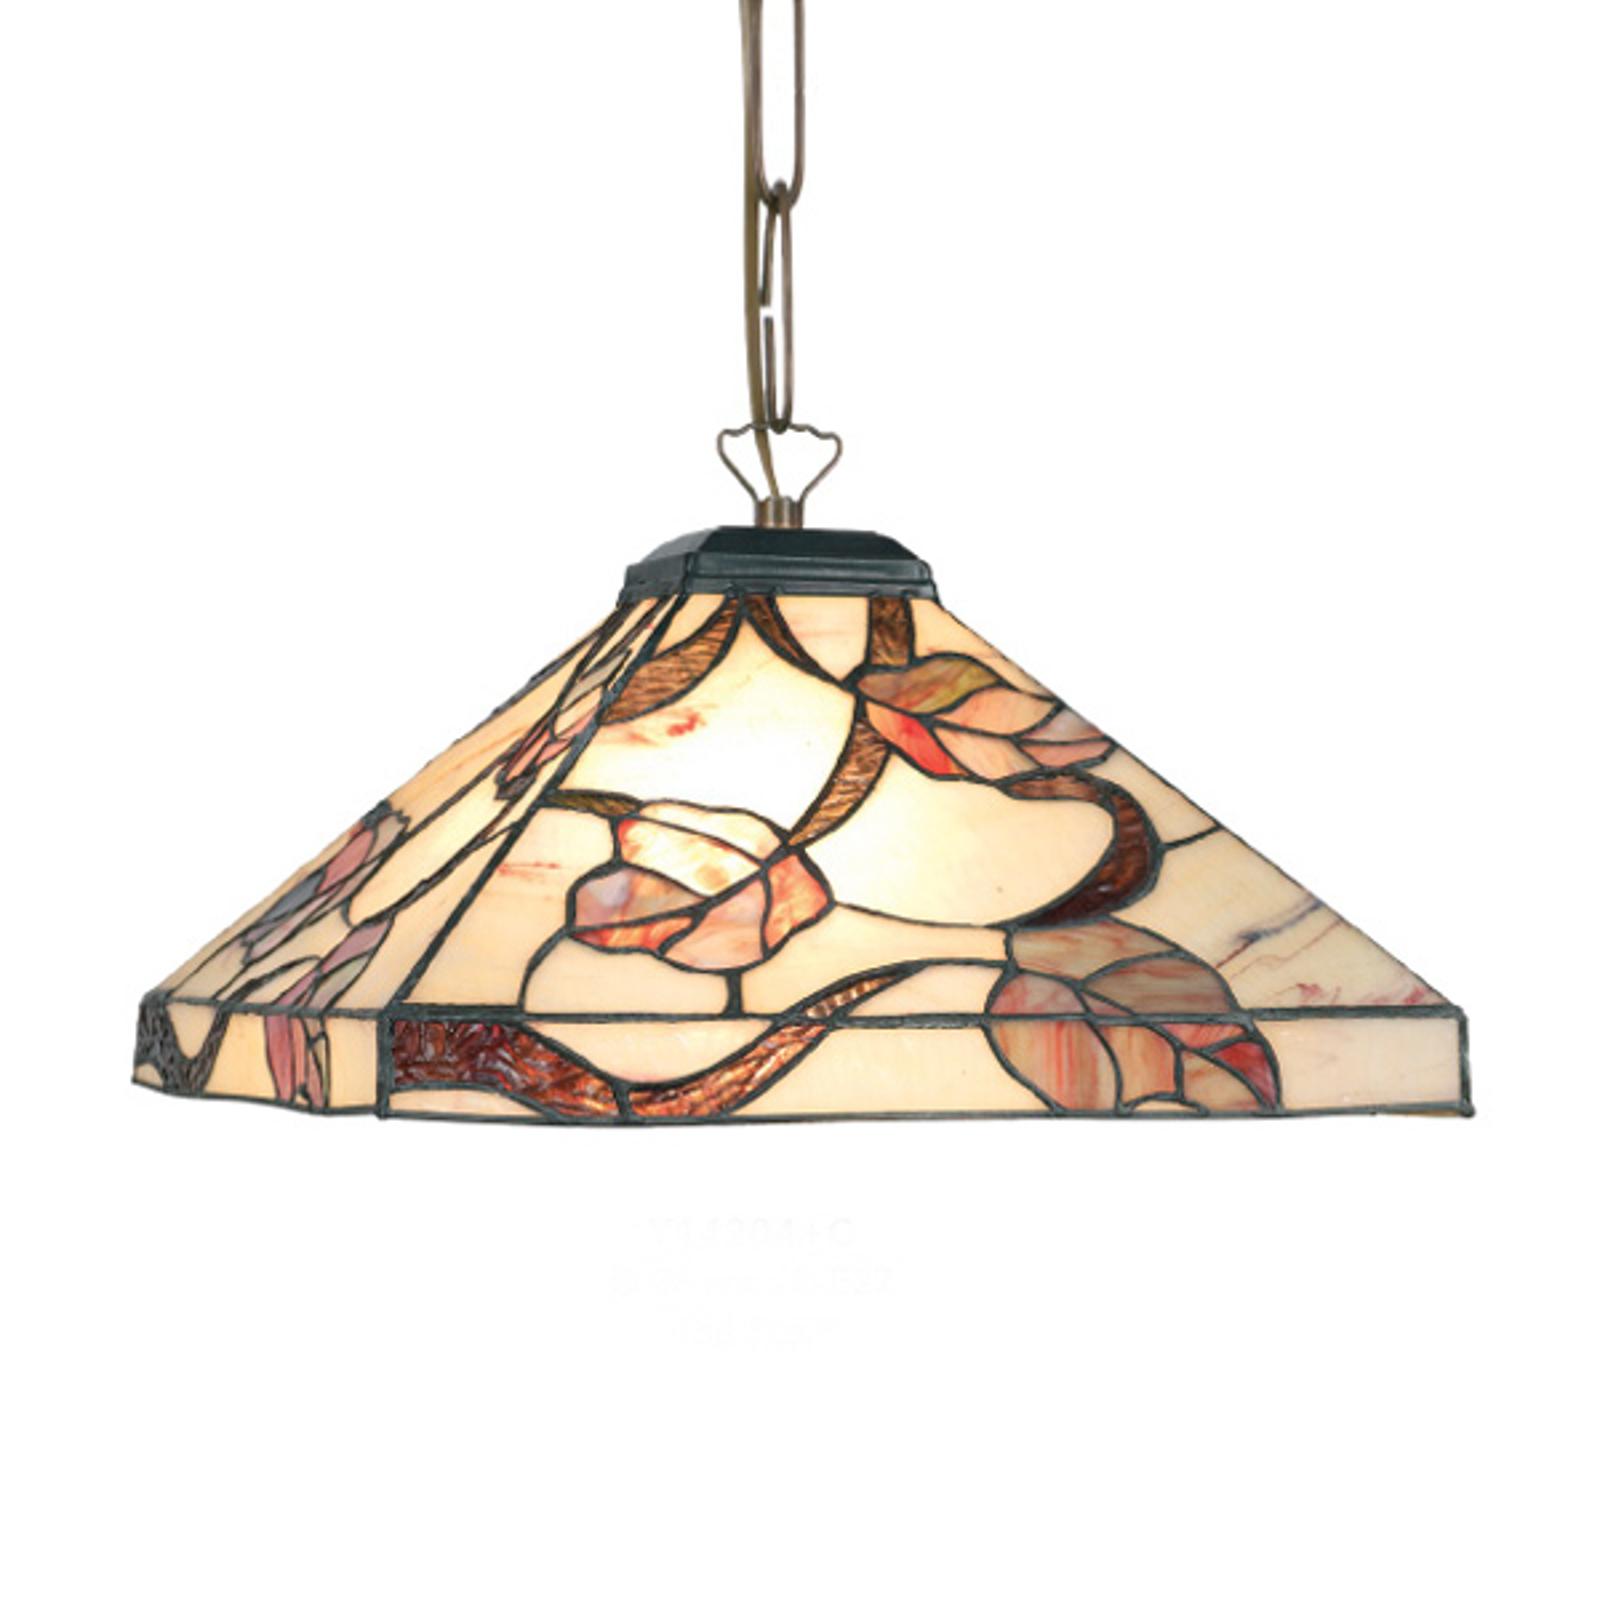 Appolonia hanging light, Tiffany-style_1032134_1